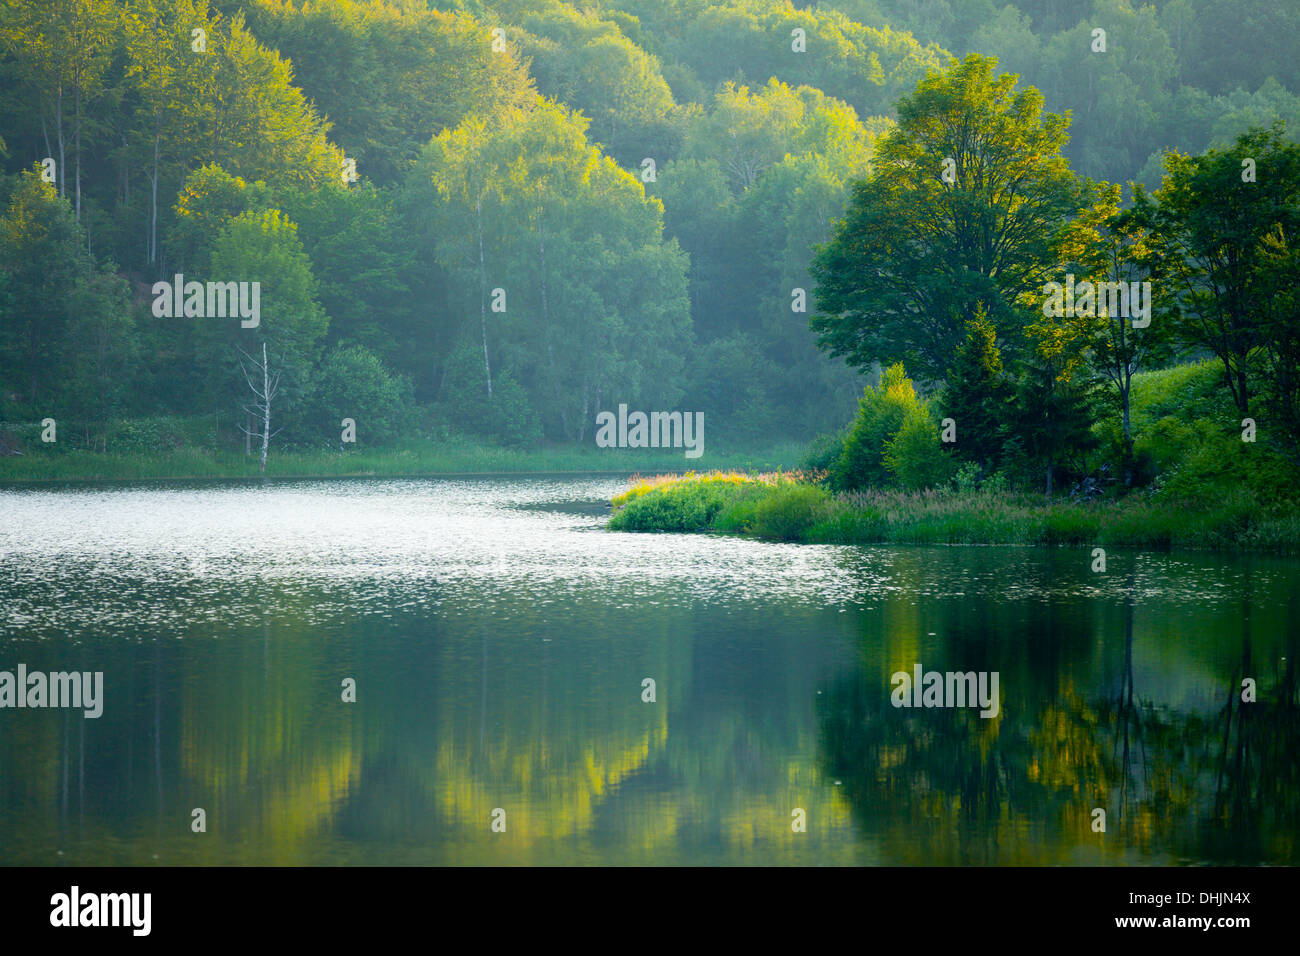 Serene lake coastline peaceful serene serenity Stock Photo